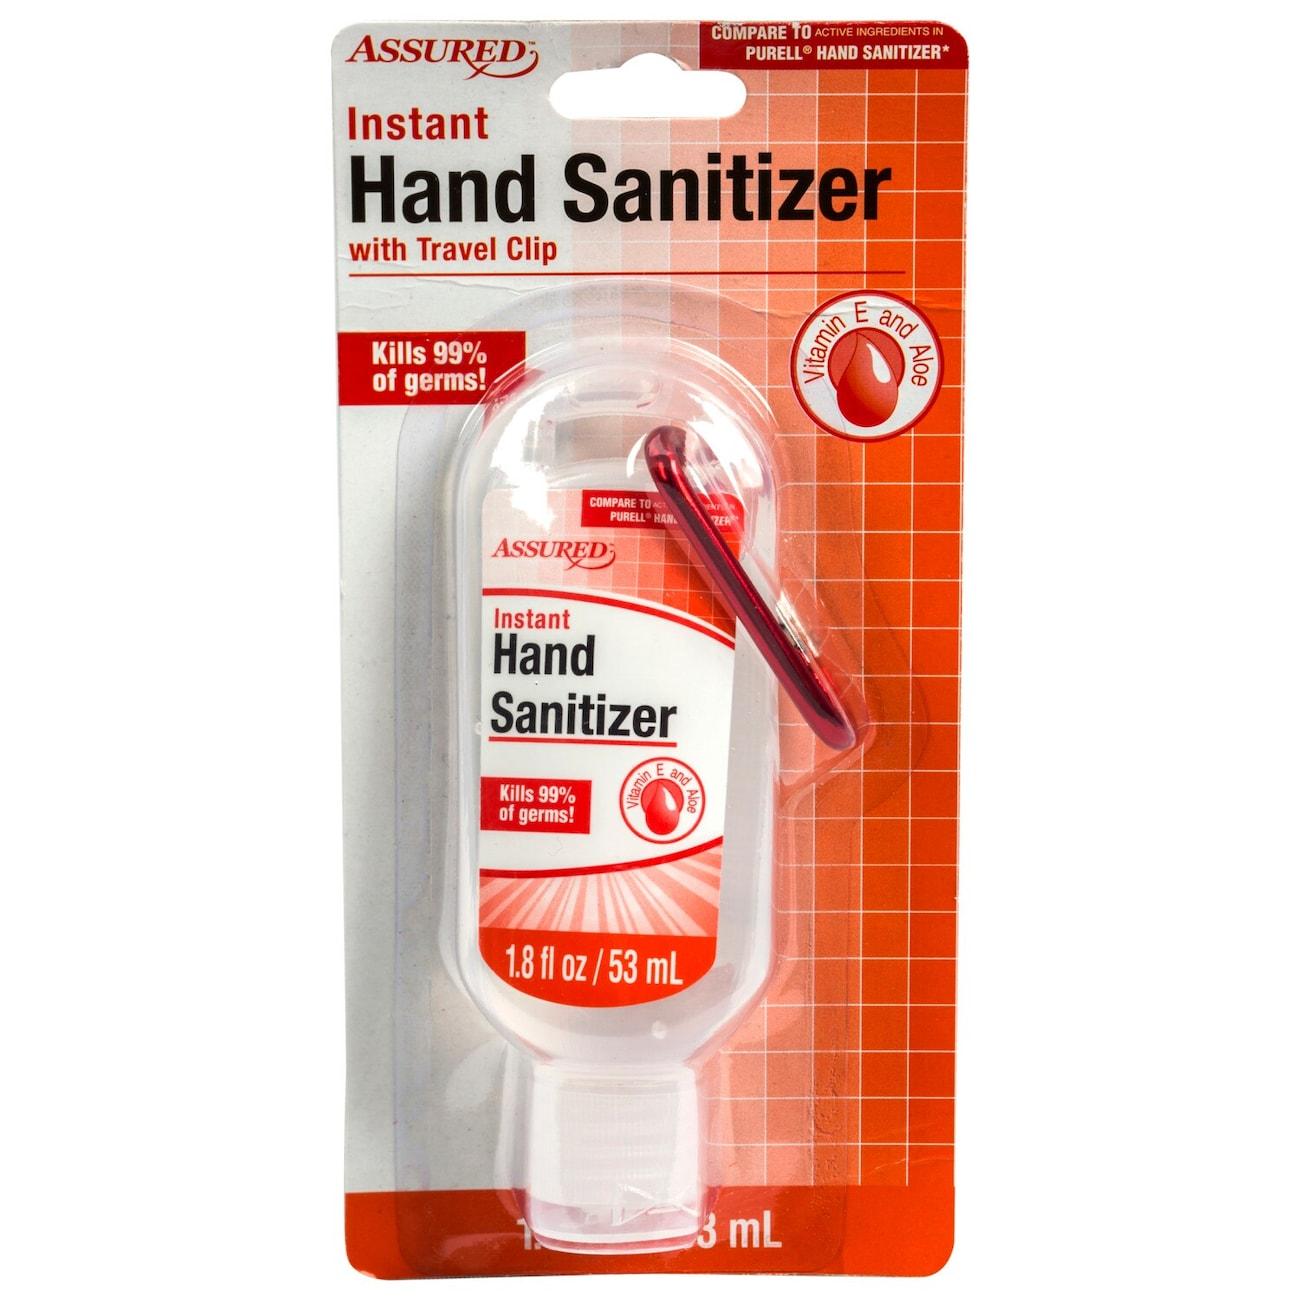 Hand Sanitizer - Dollar Tree, Inc